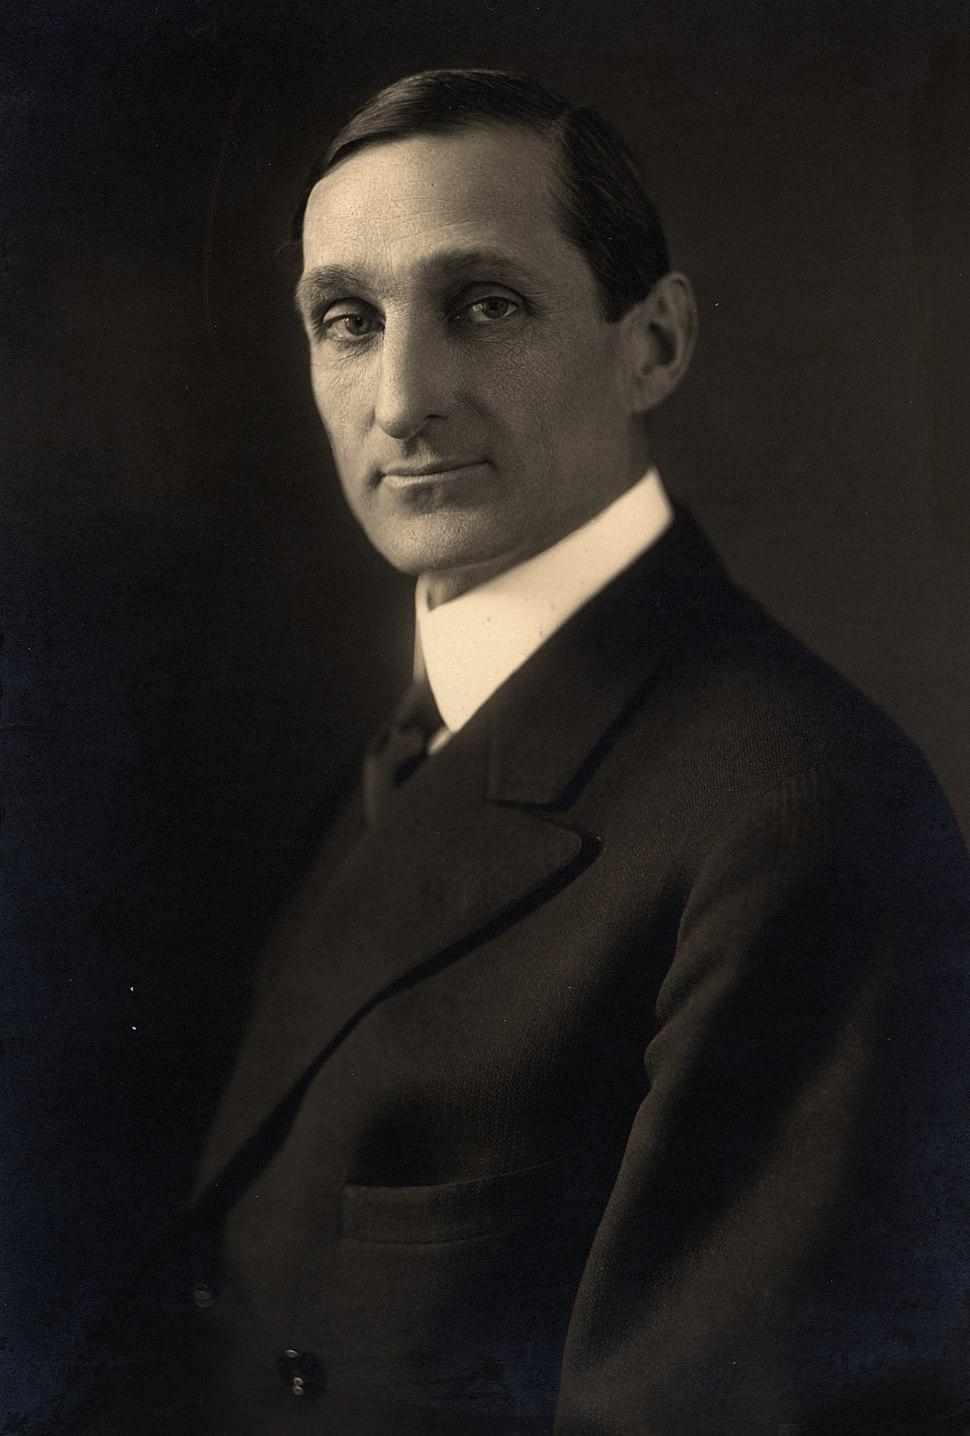 William Gibbs McAdoo, formal photo portrait, 1914